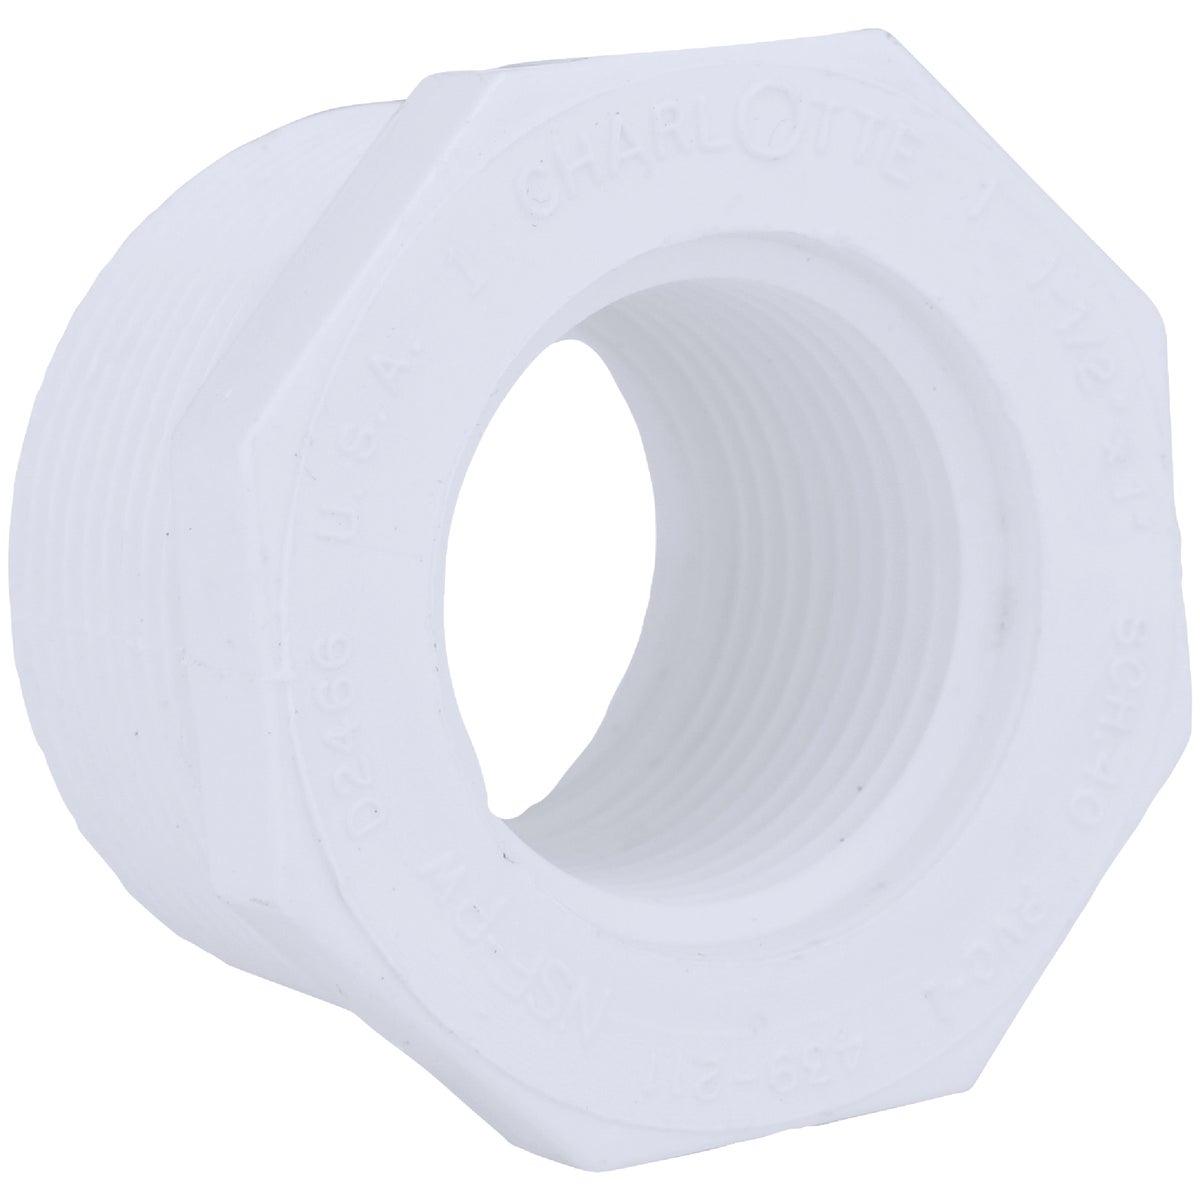 1-1/2X1 PVC MXF BUSHING